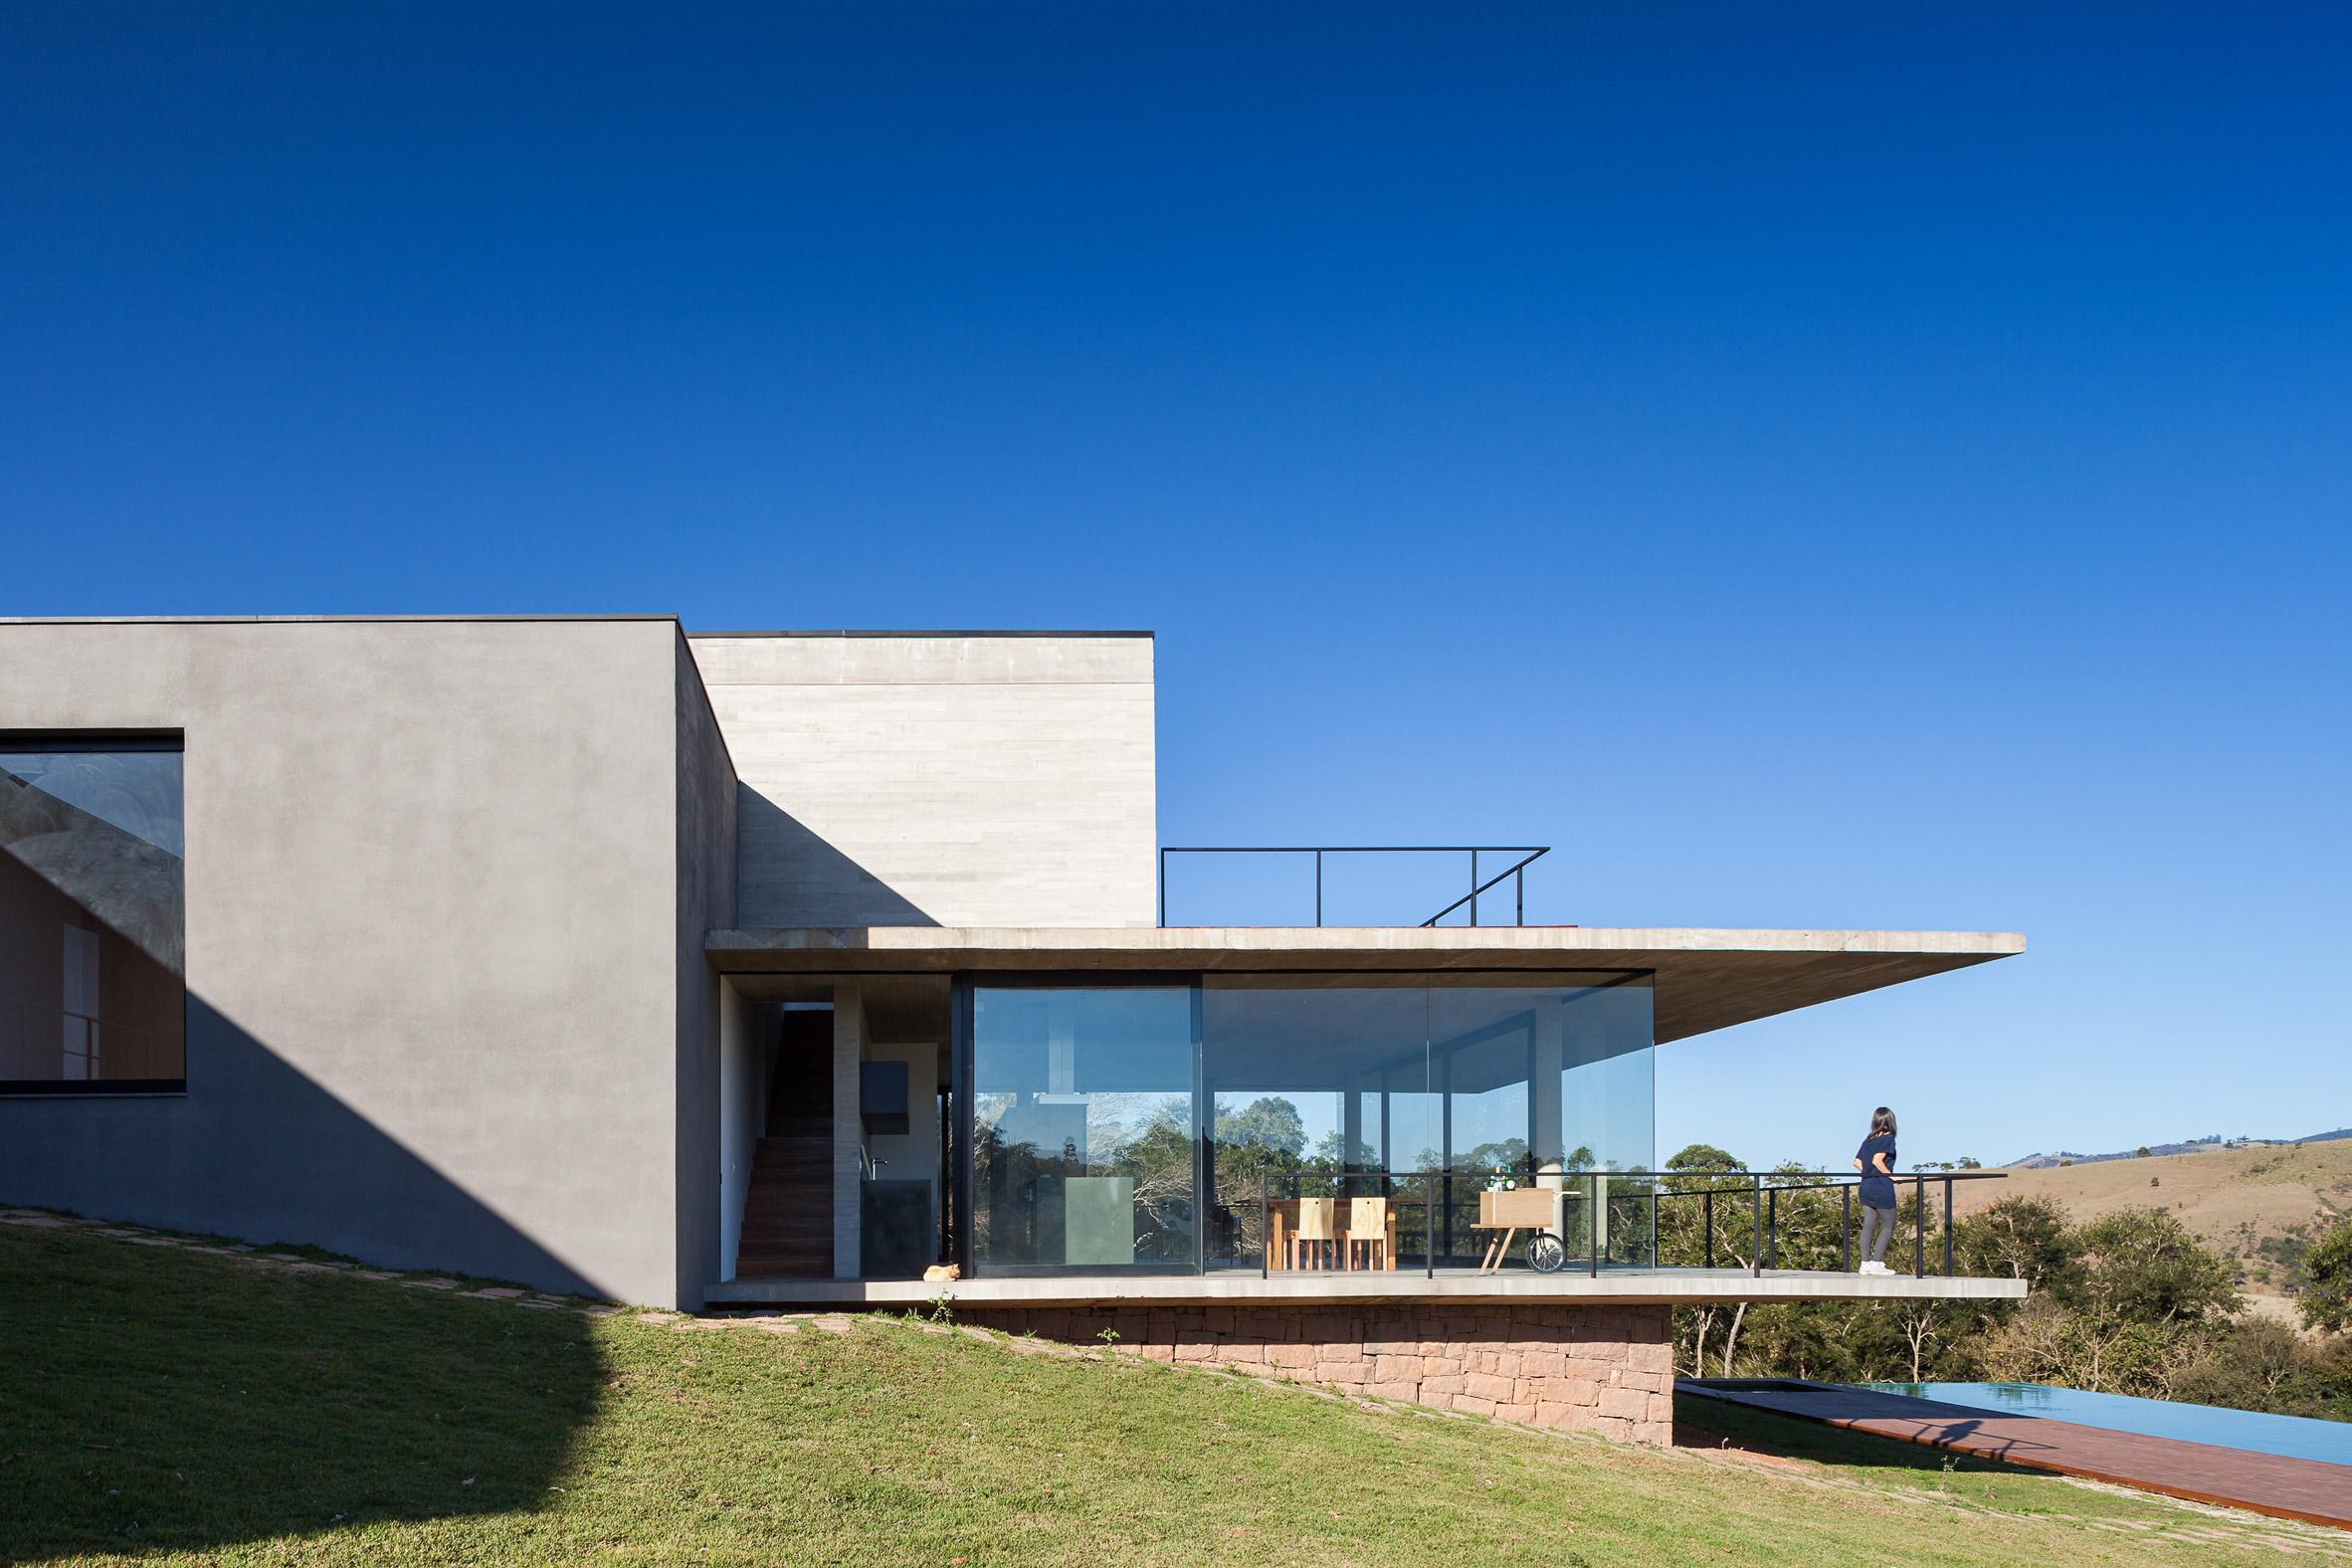 Concrete balcony extends from Brazilian house by Felipe Rodrigues